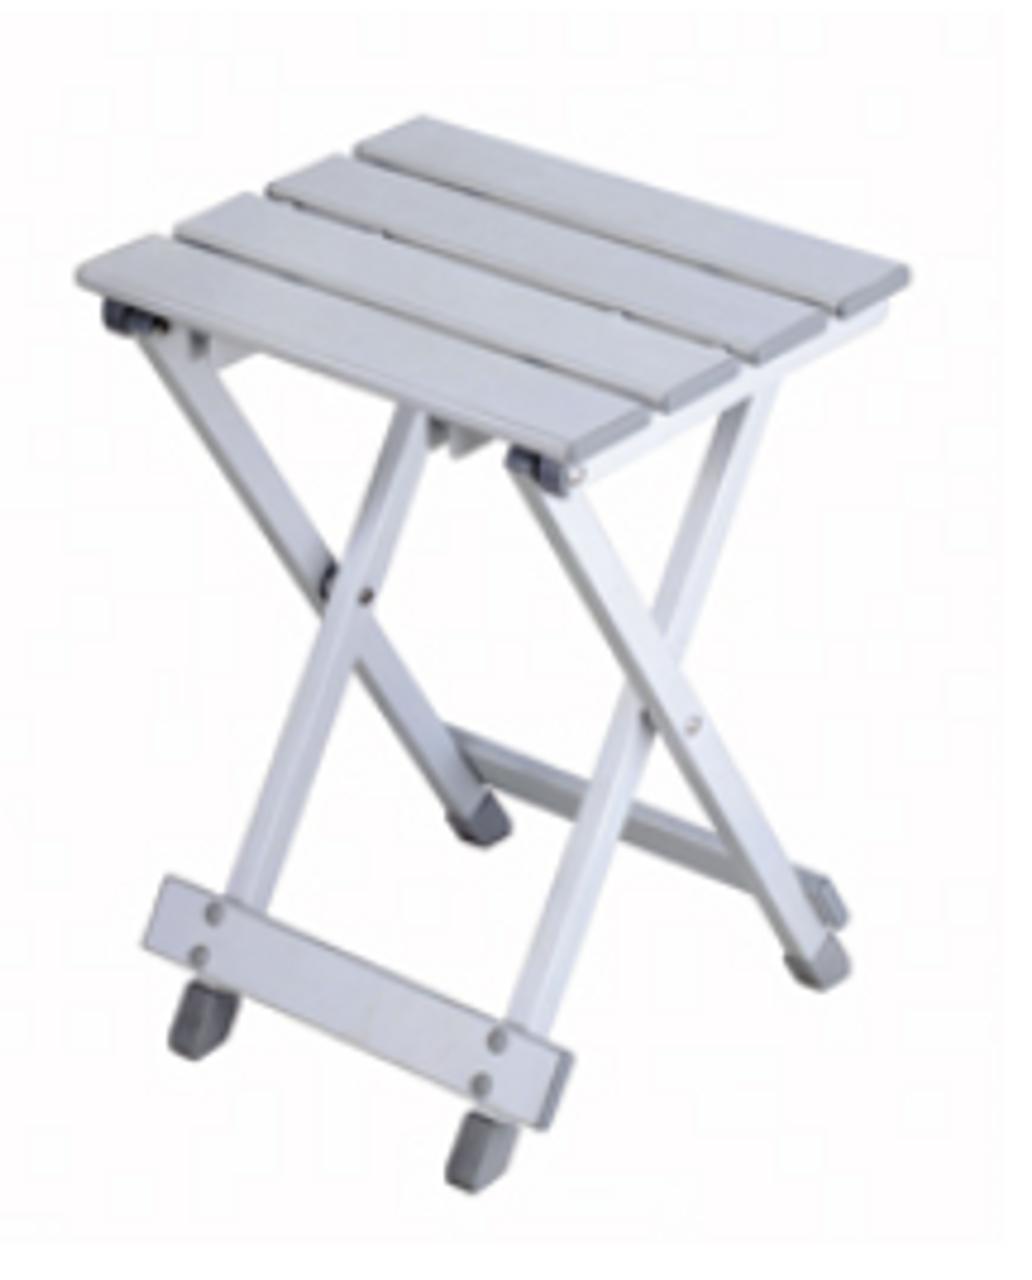 SMALL ALUMINUM TABLE- FOLDING (03-1030)